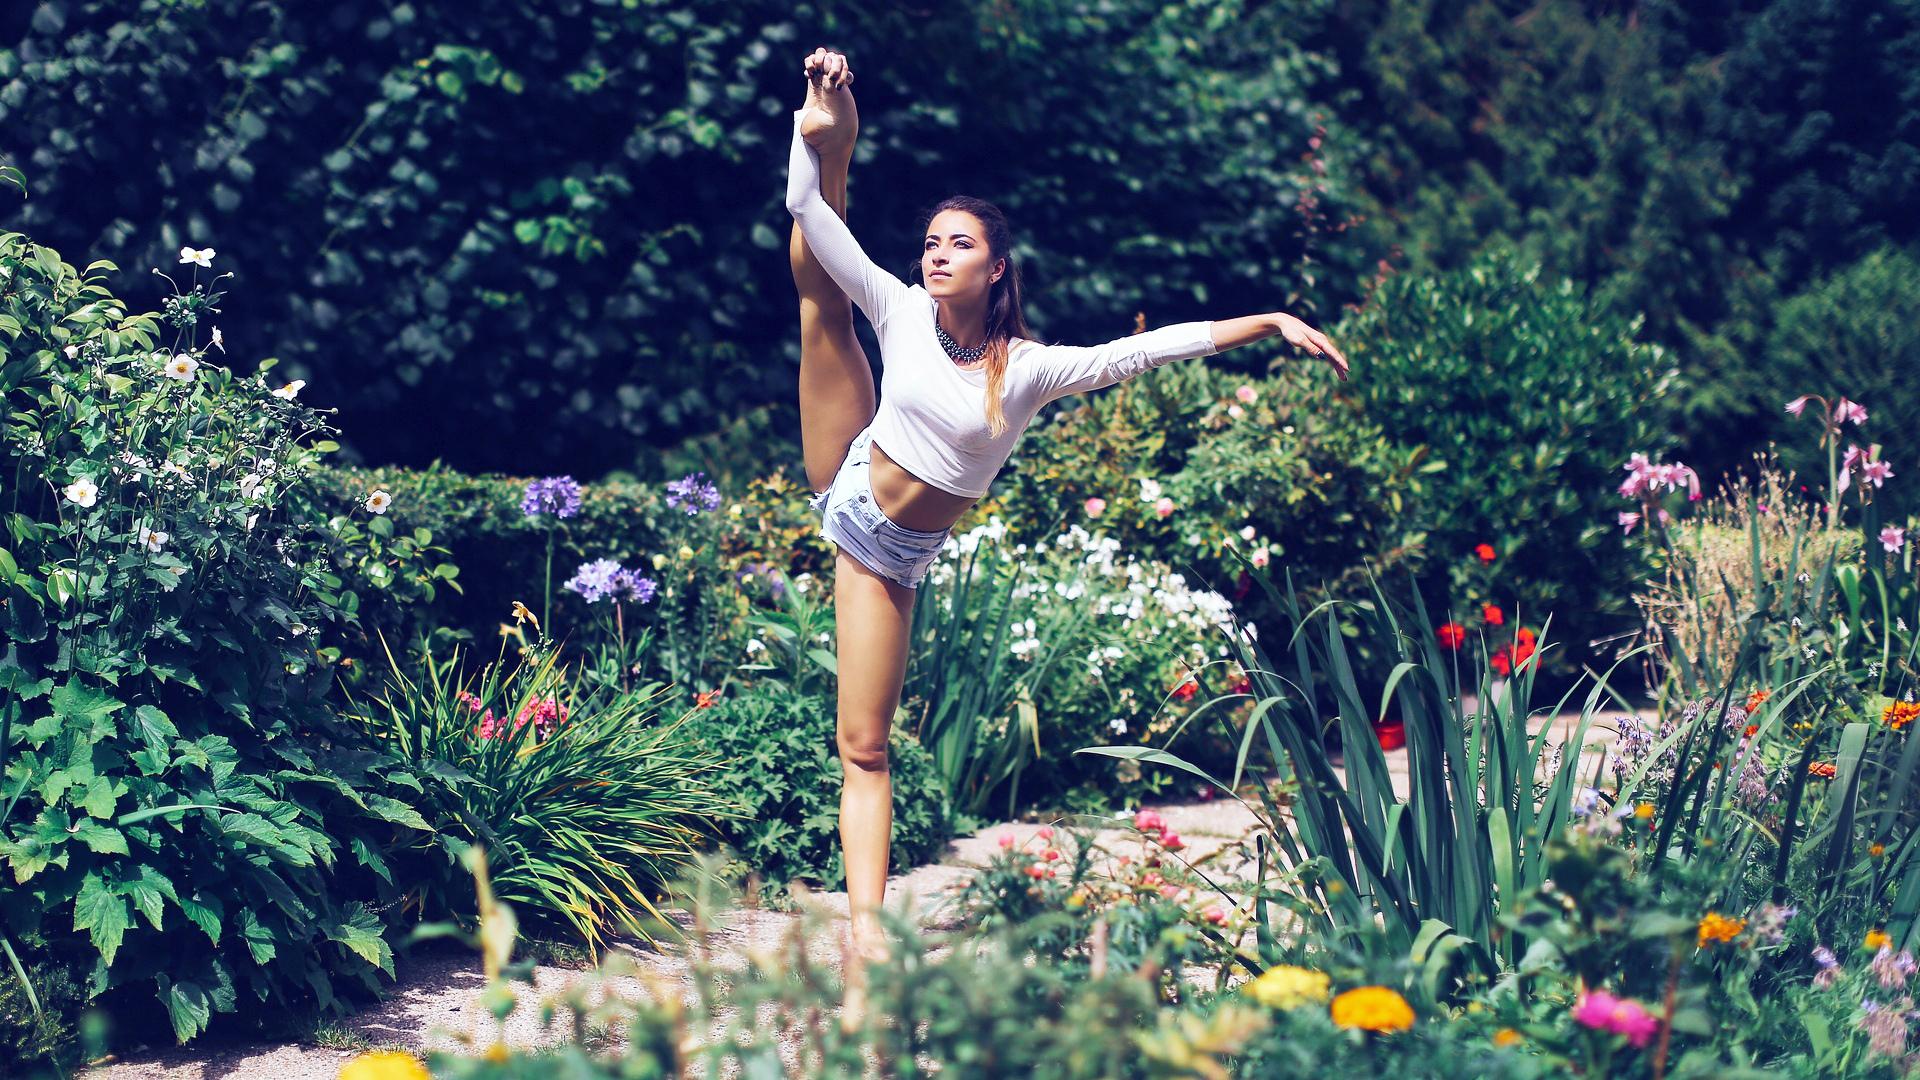 гимнастки на природе фото держись марина